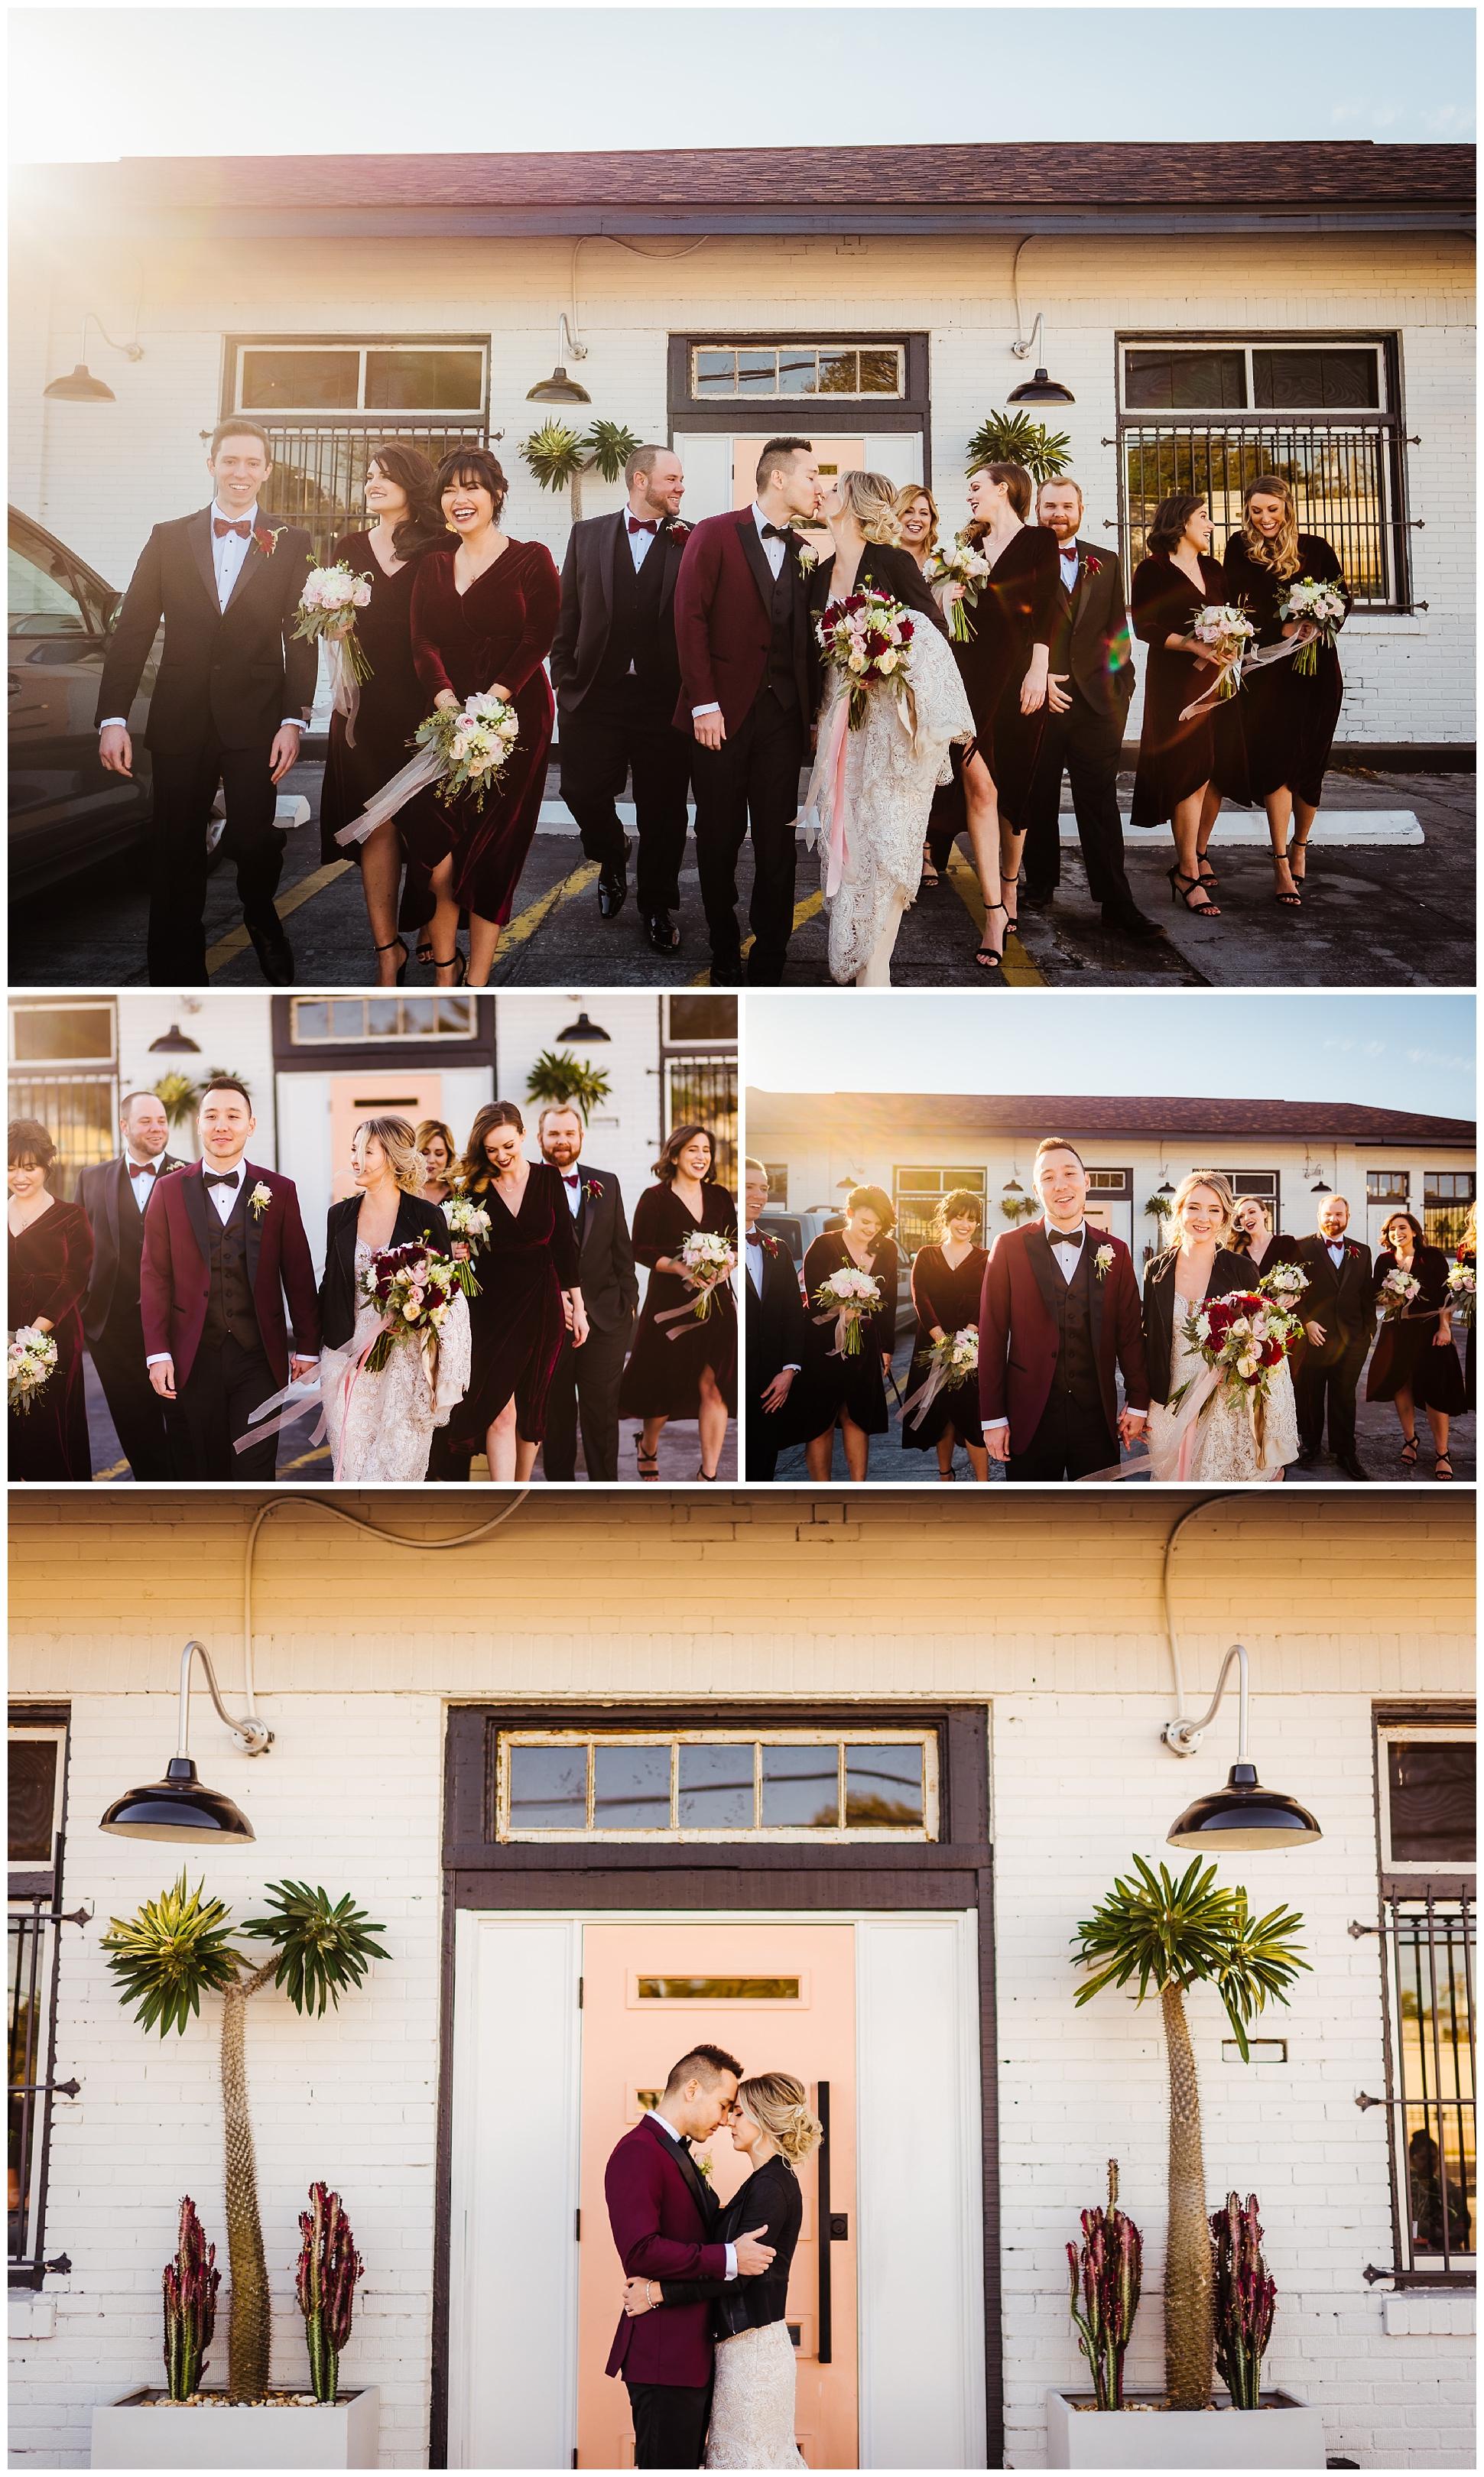 tampa-armeture-wedding-photographer-edgy-industrial-downtown-fancy-free-nursery-tattoo-burgandy-velvet_0039.jpg